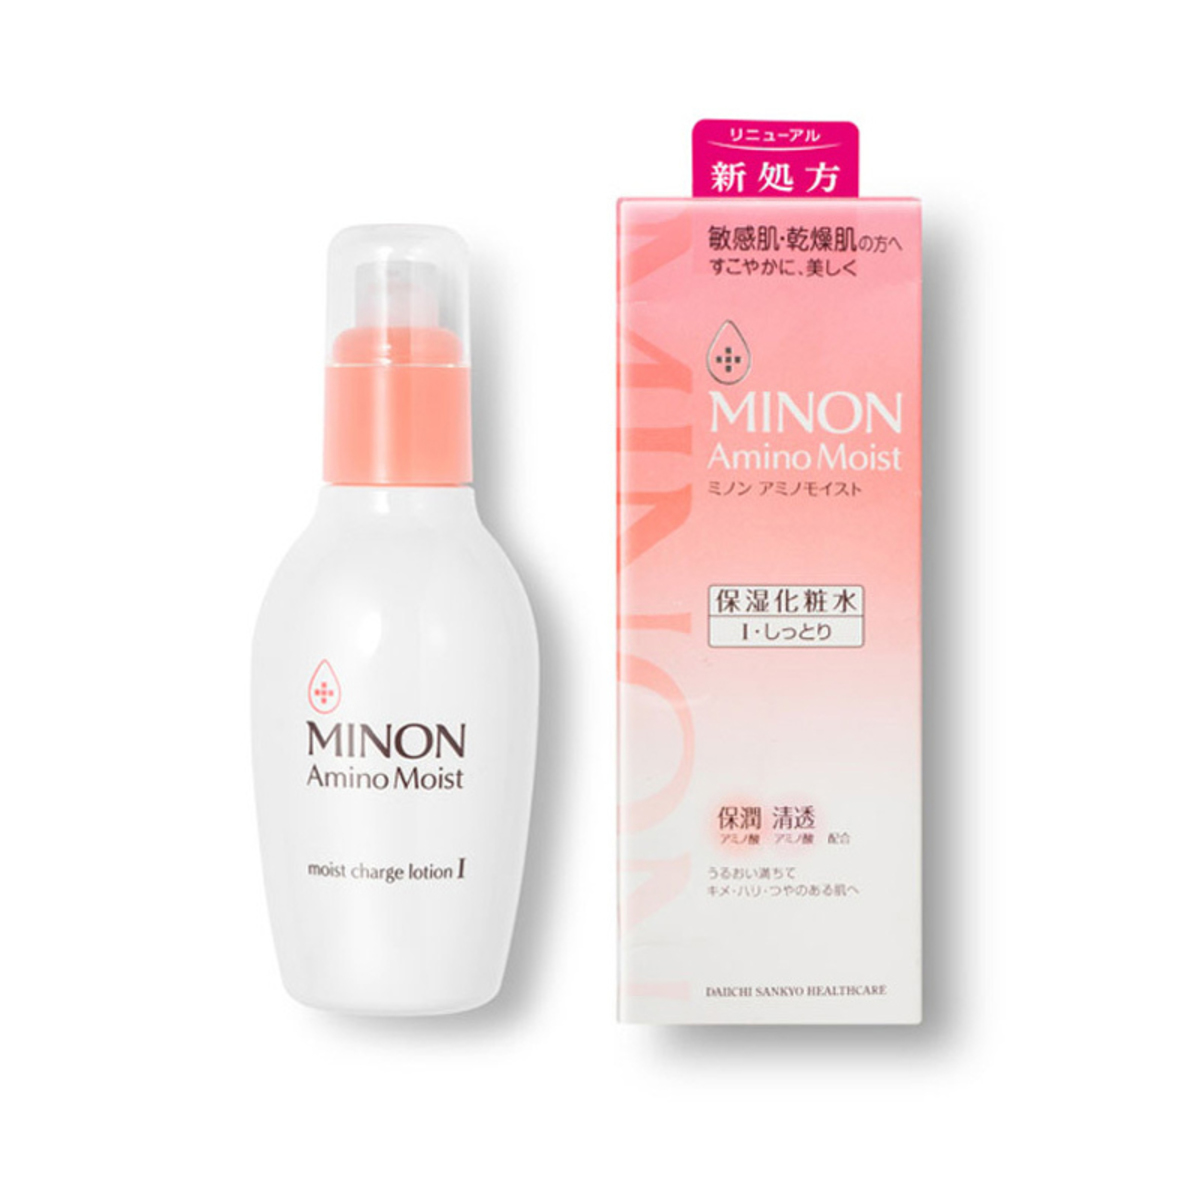 MINON Amino Moist moist charge Lotion I (Light) 氨基酸保濕化妝水 I (清爽) 150ml